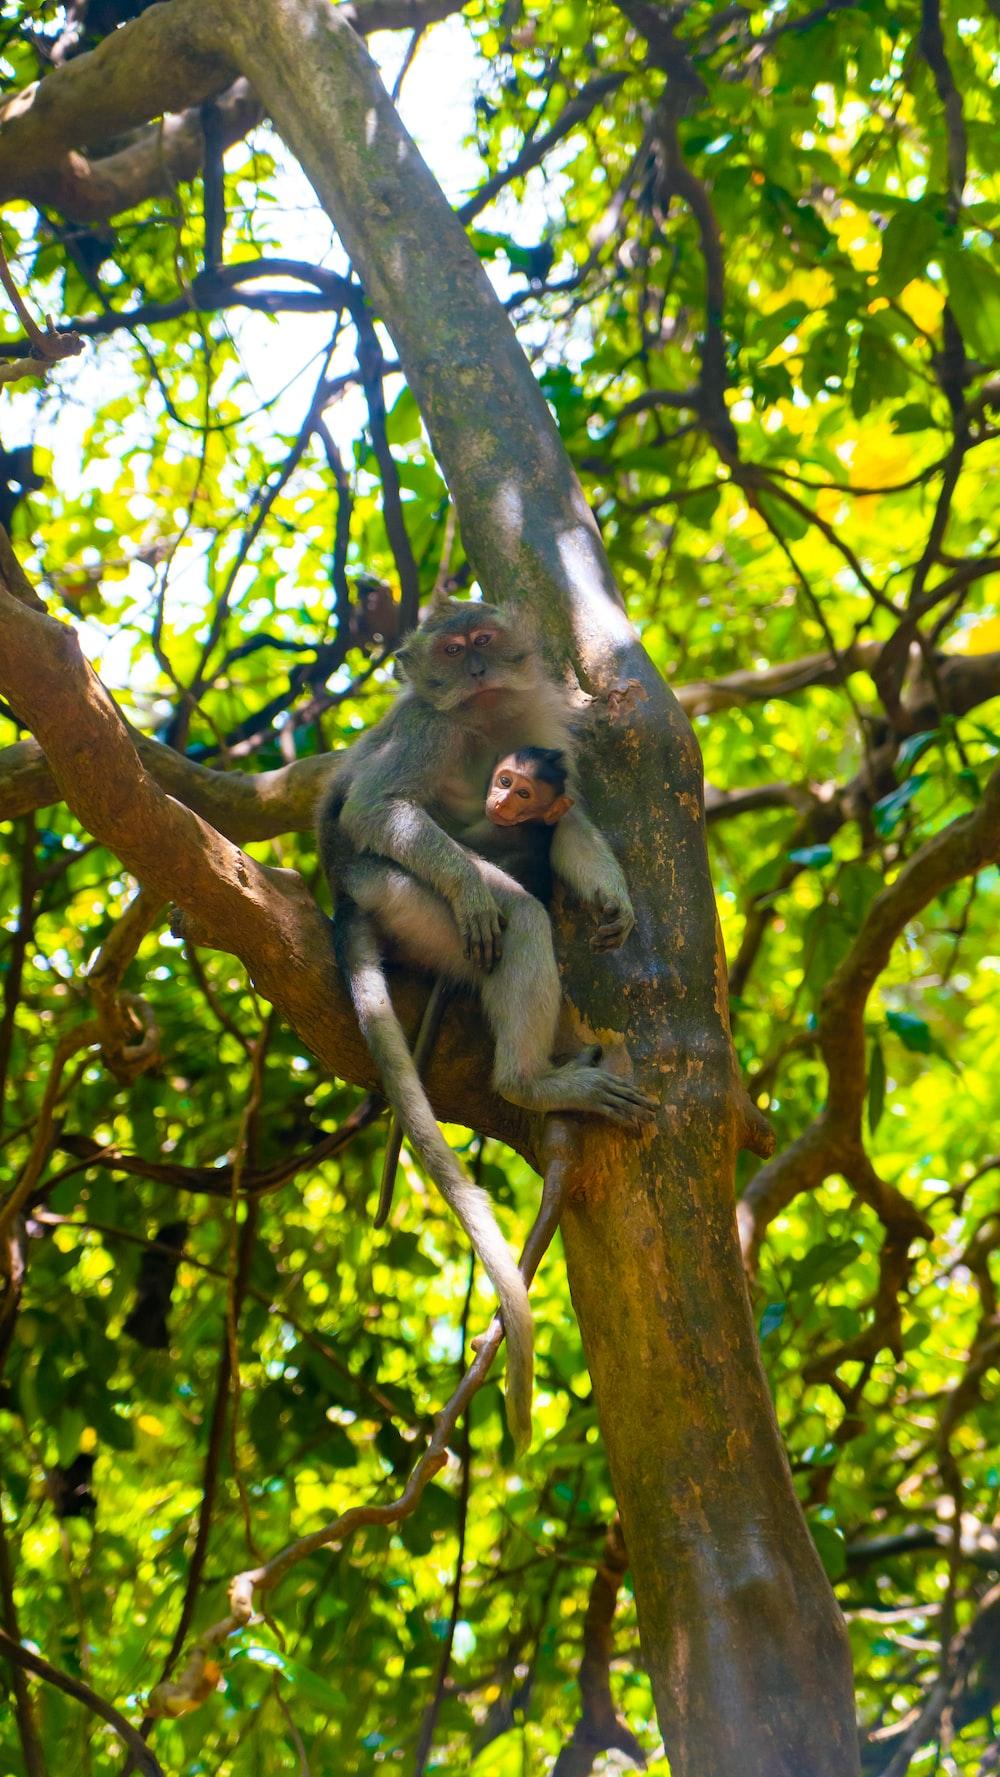 monkey on tree branch during daytime